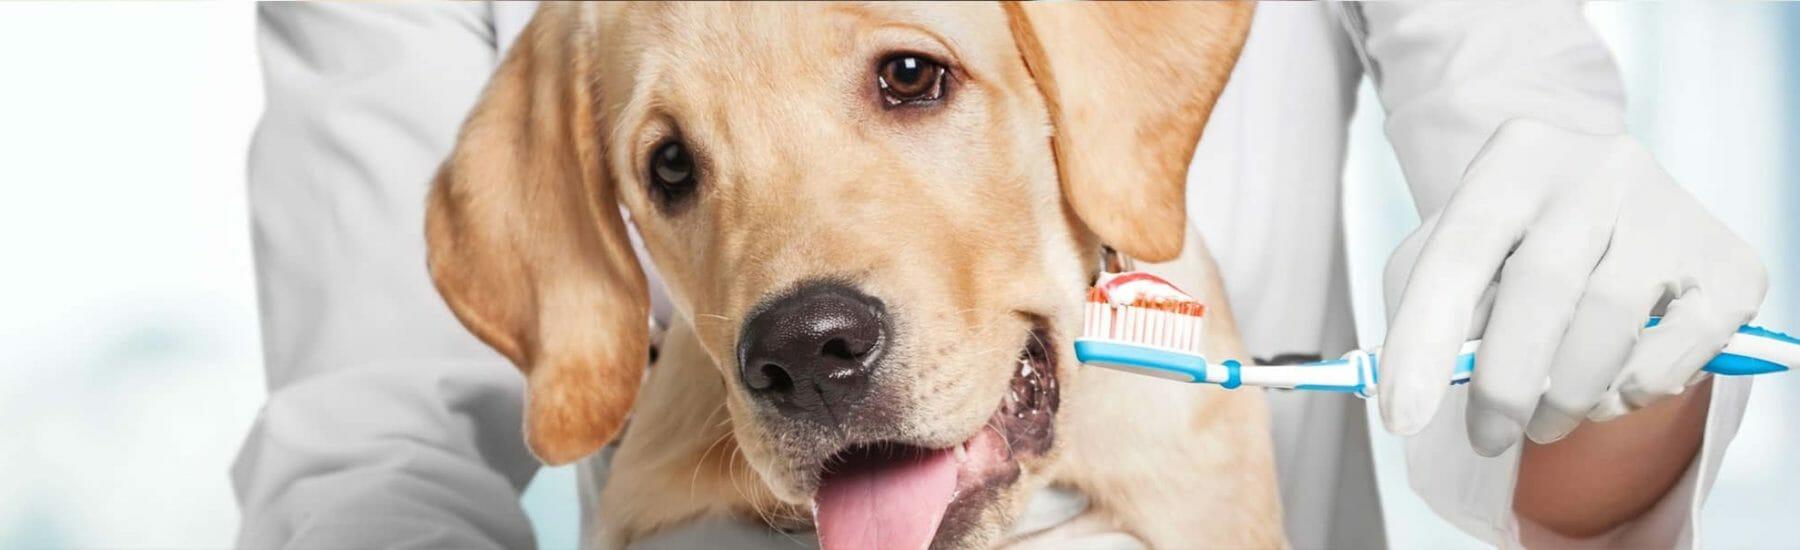 Golden lab having their teeth brushed